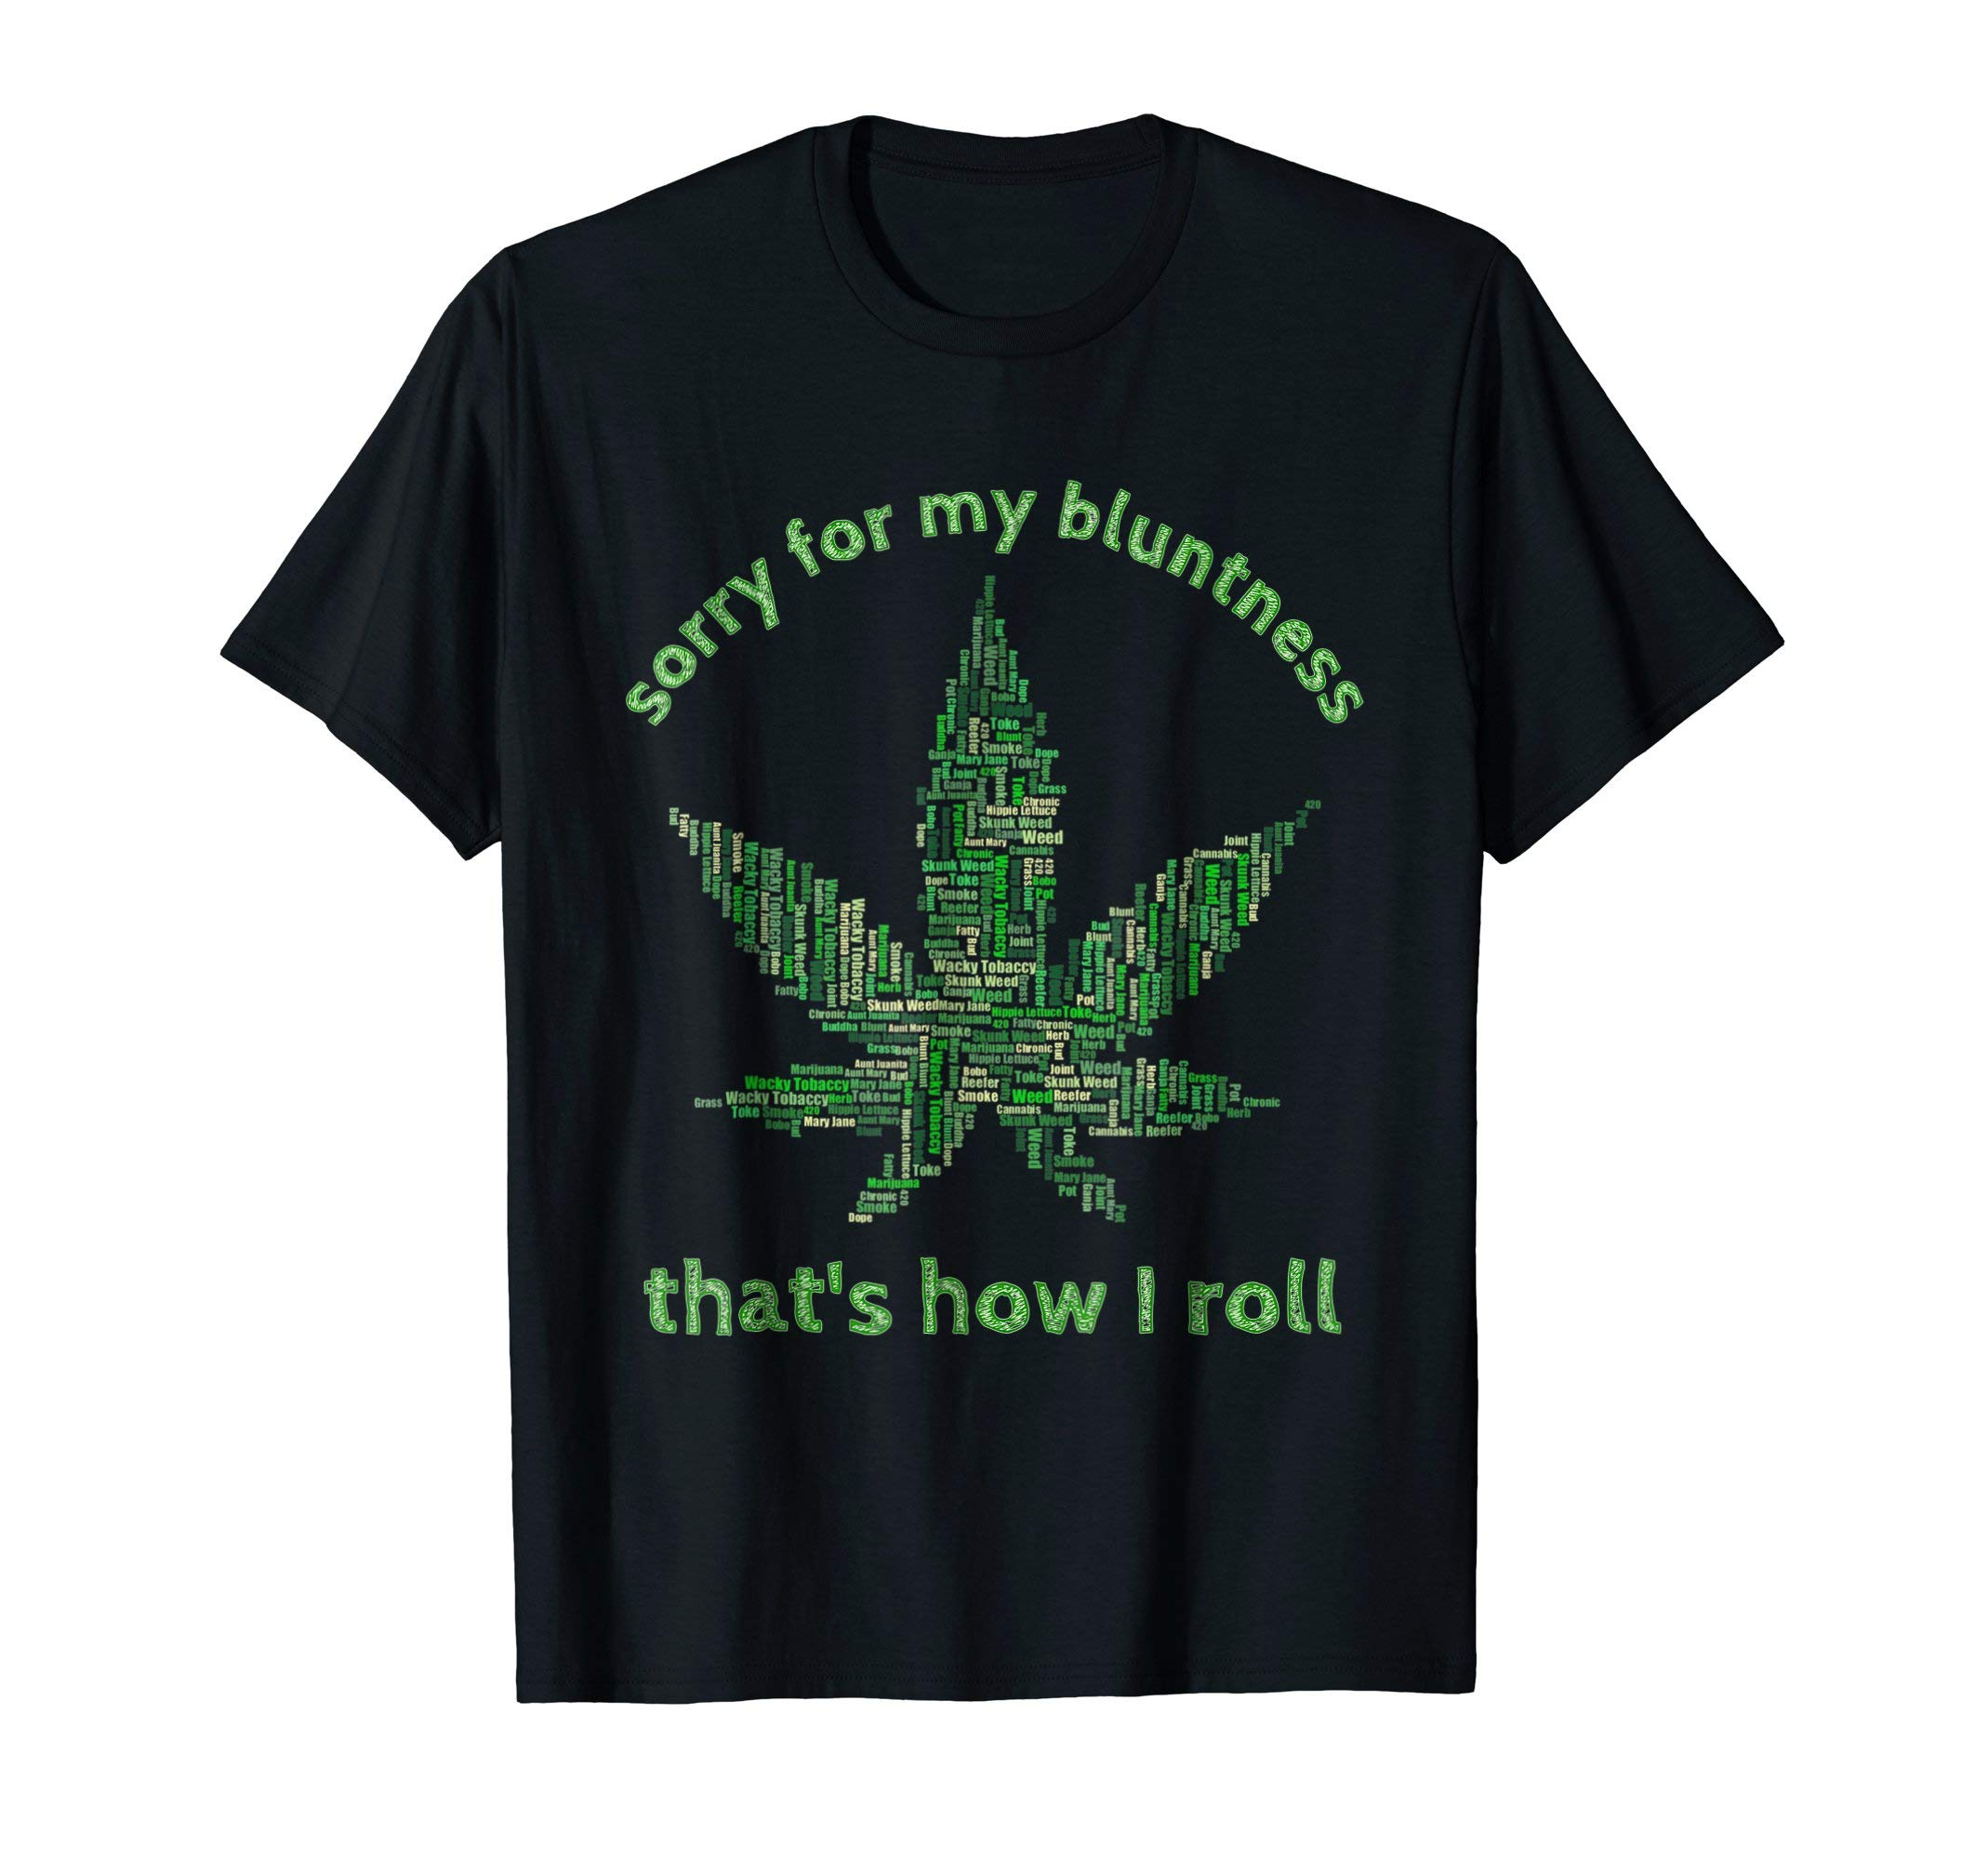 Funny Weed T-shirt 420 Pot Smoker Humor Gift Tshirt